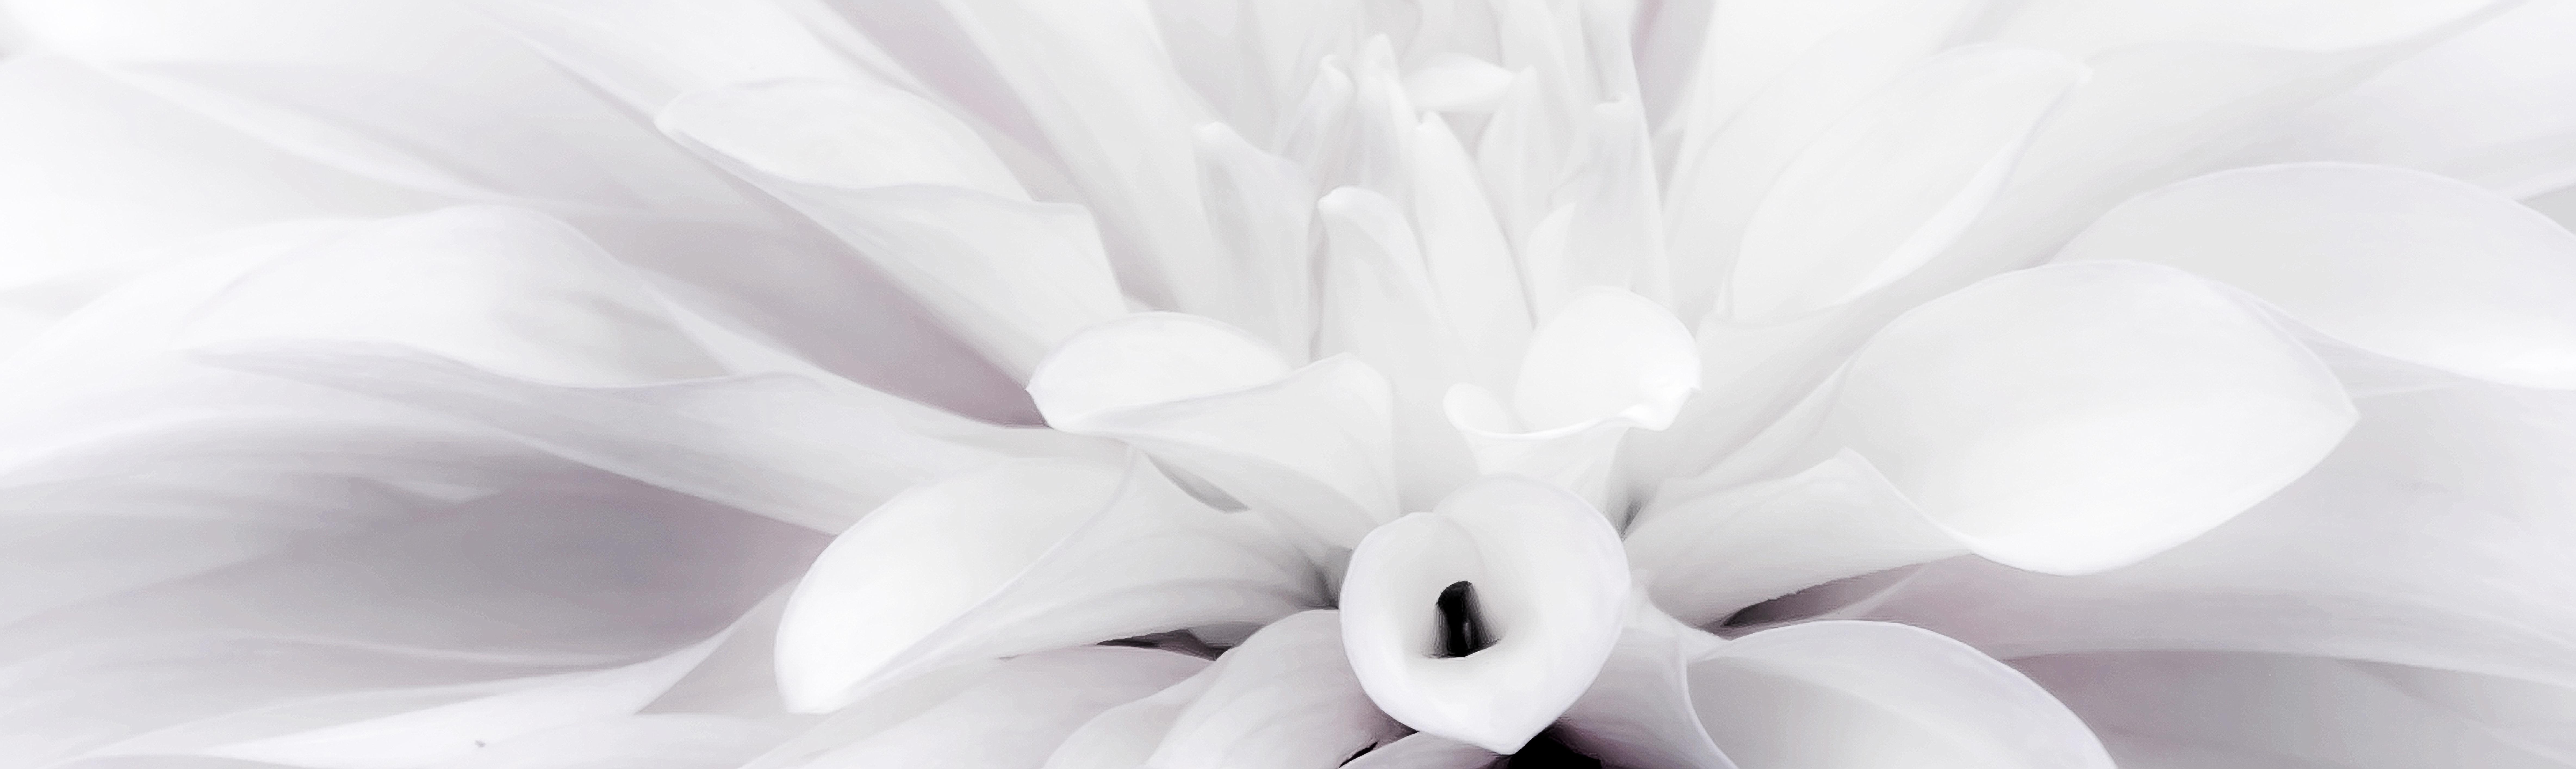 Free images blossom black and white petal bloom pink lighting free images blossom black and white petal bloom pink lighting close up flower garden late summer dahlia garden peony macro photography izmirmasajfo